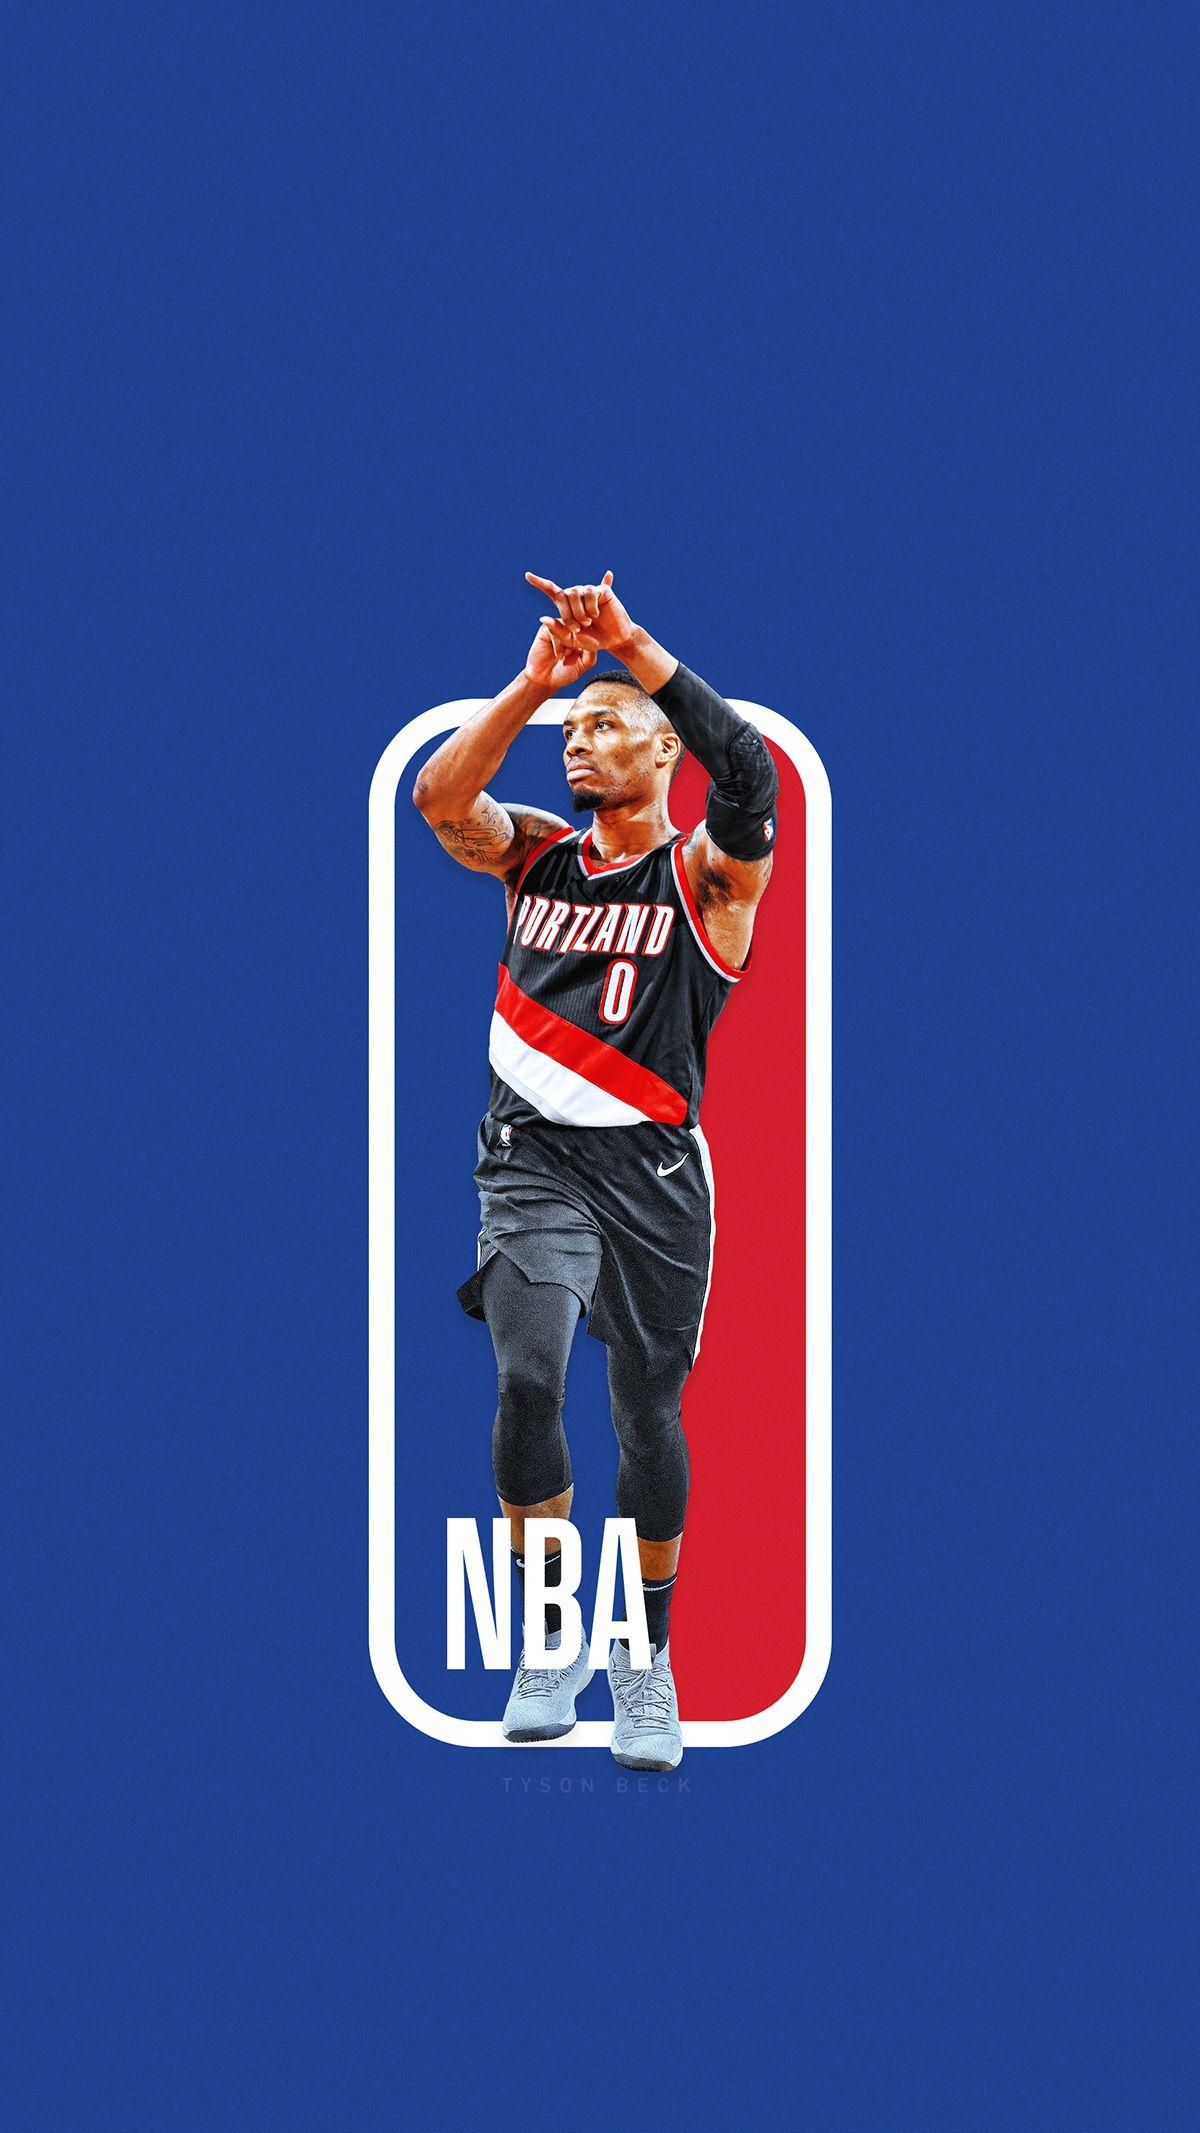 The Next NBA logo? NBA Logoman Series on Behance